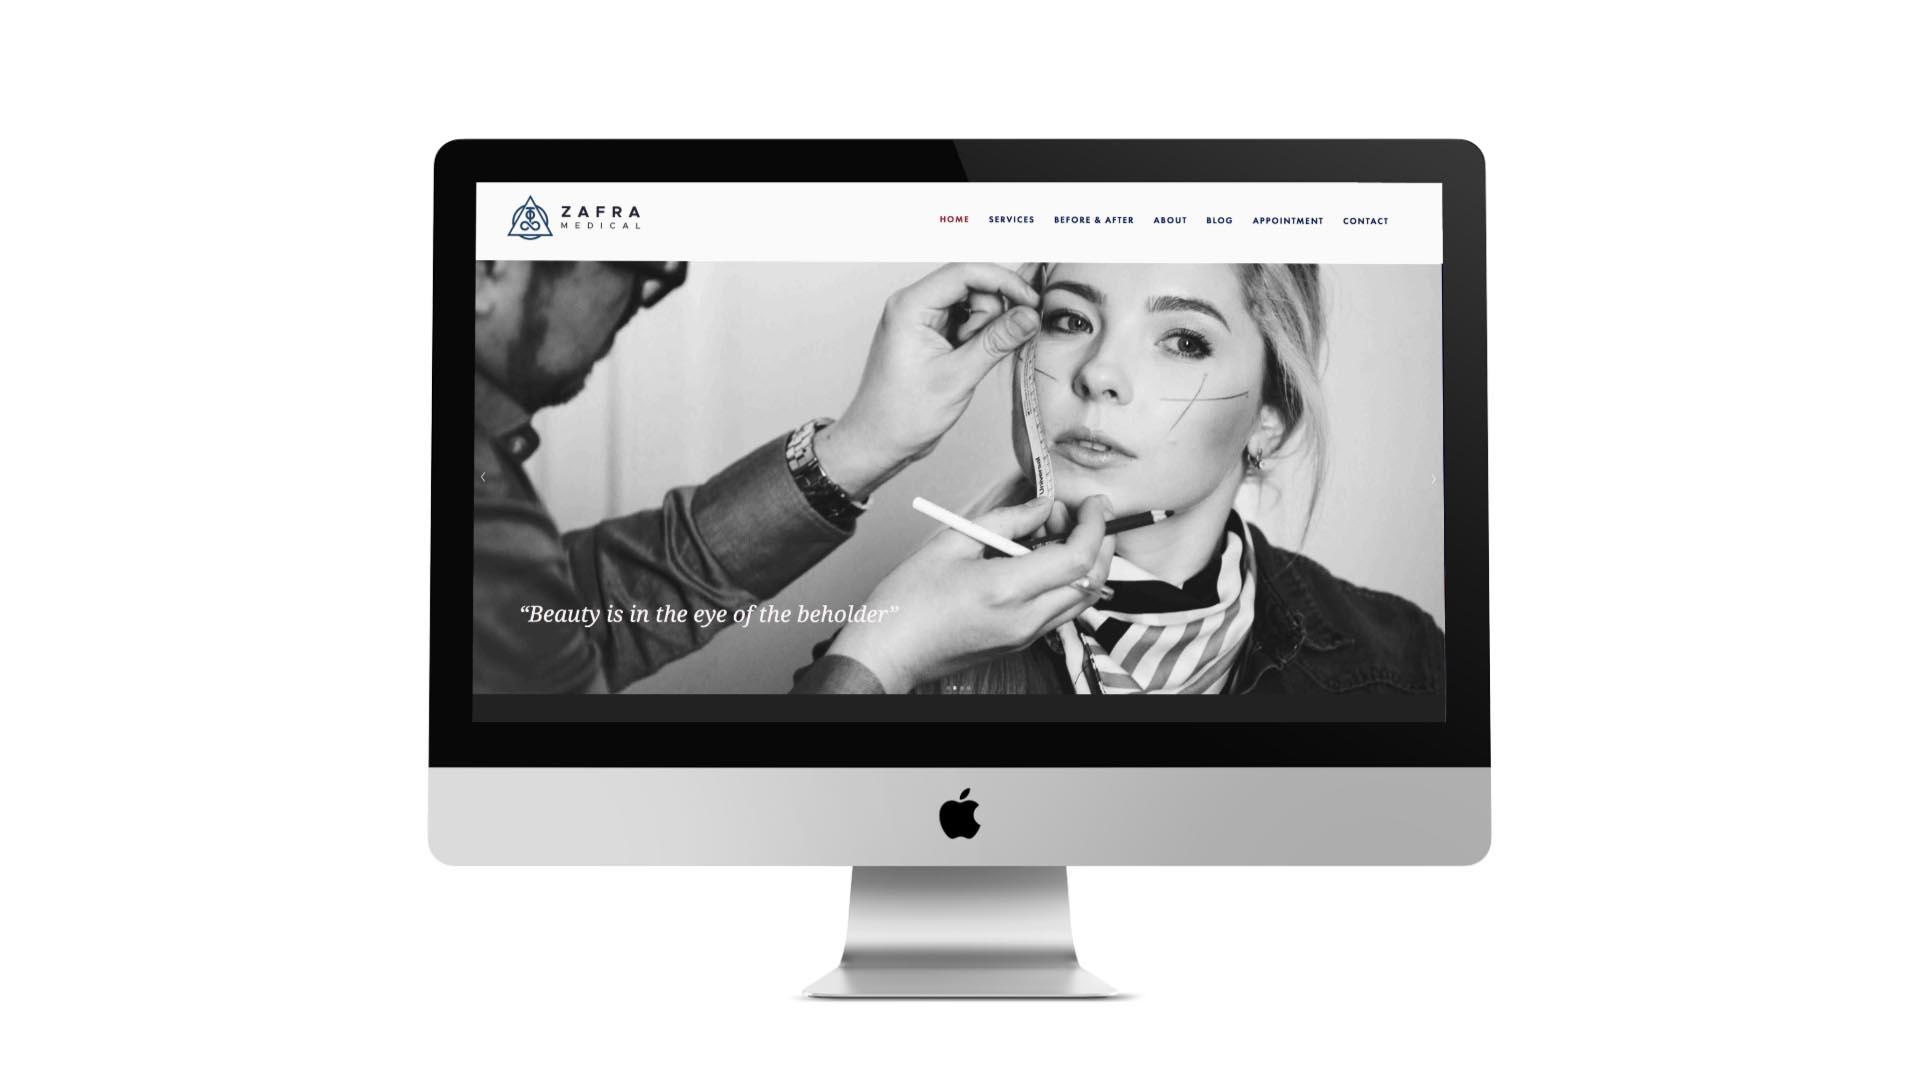 squarespace-website-zafra-visuable